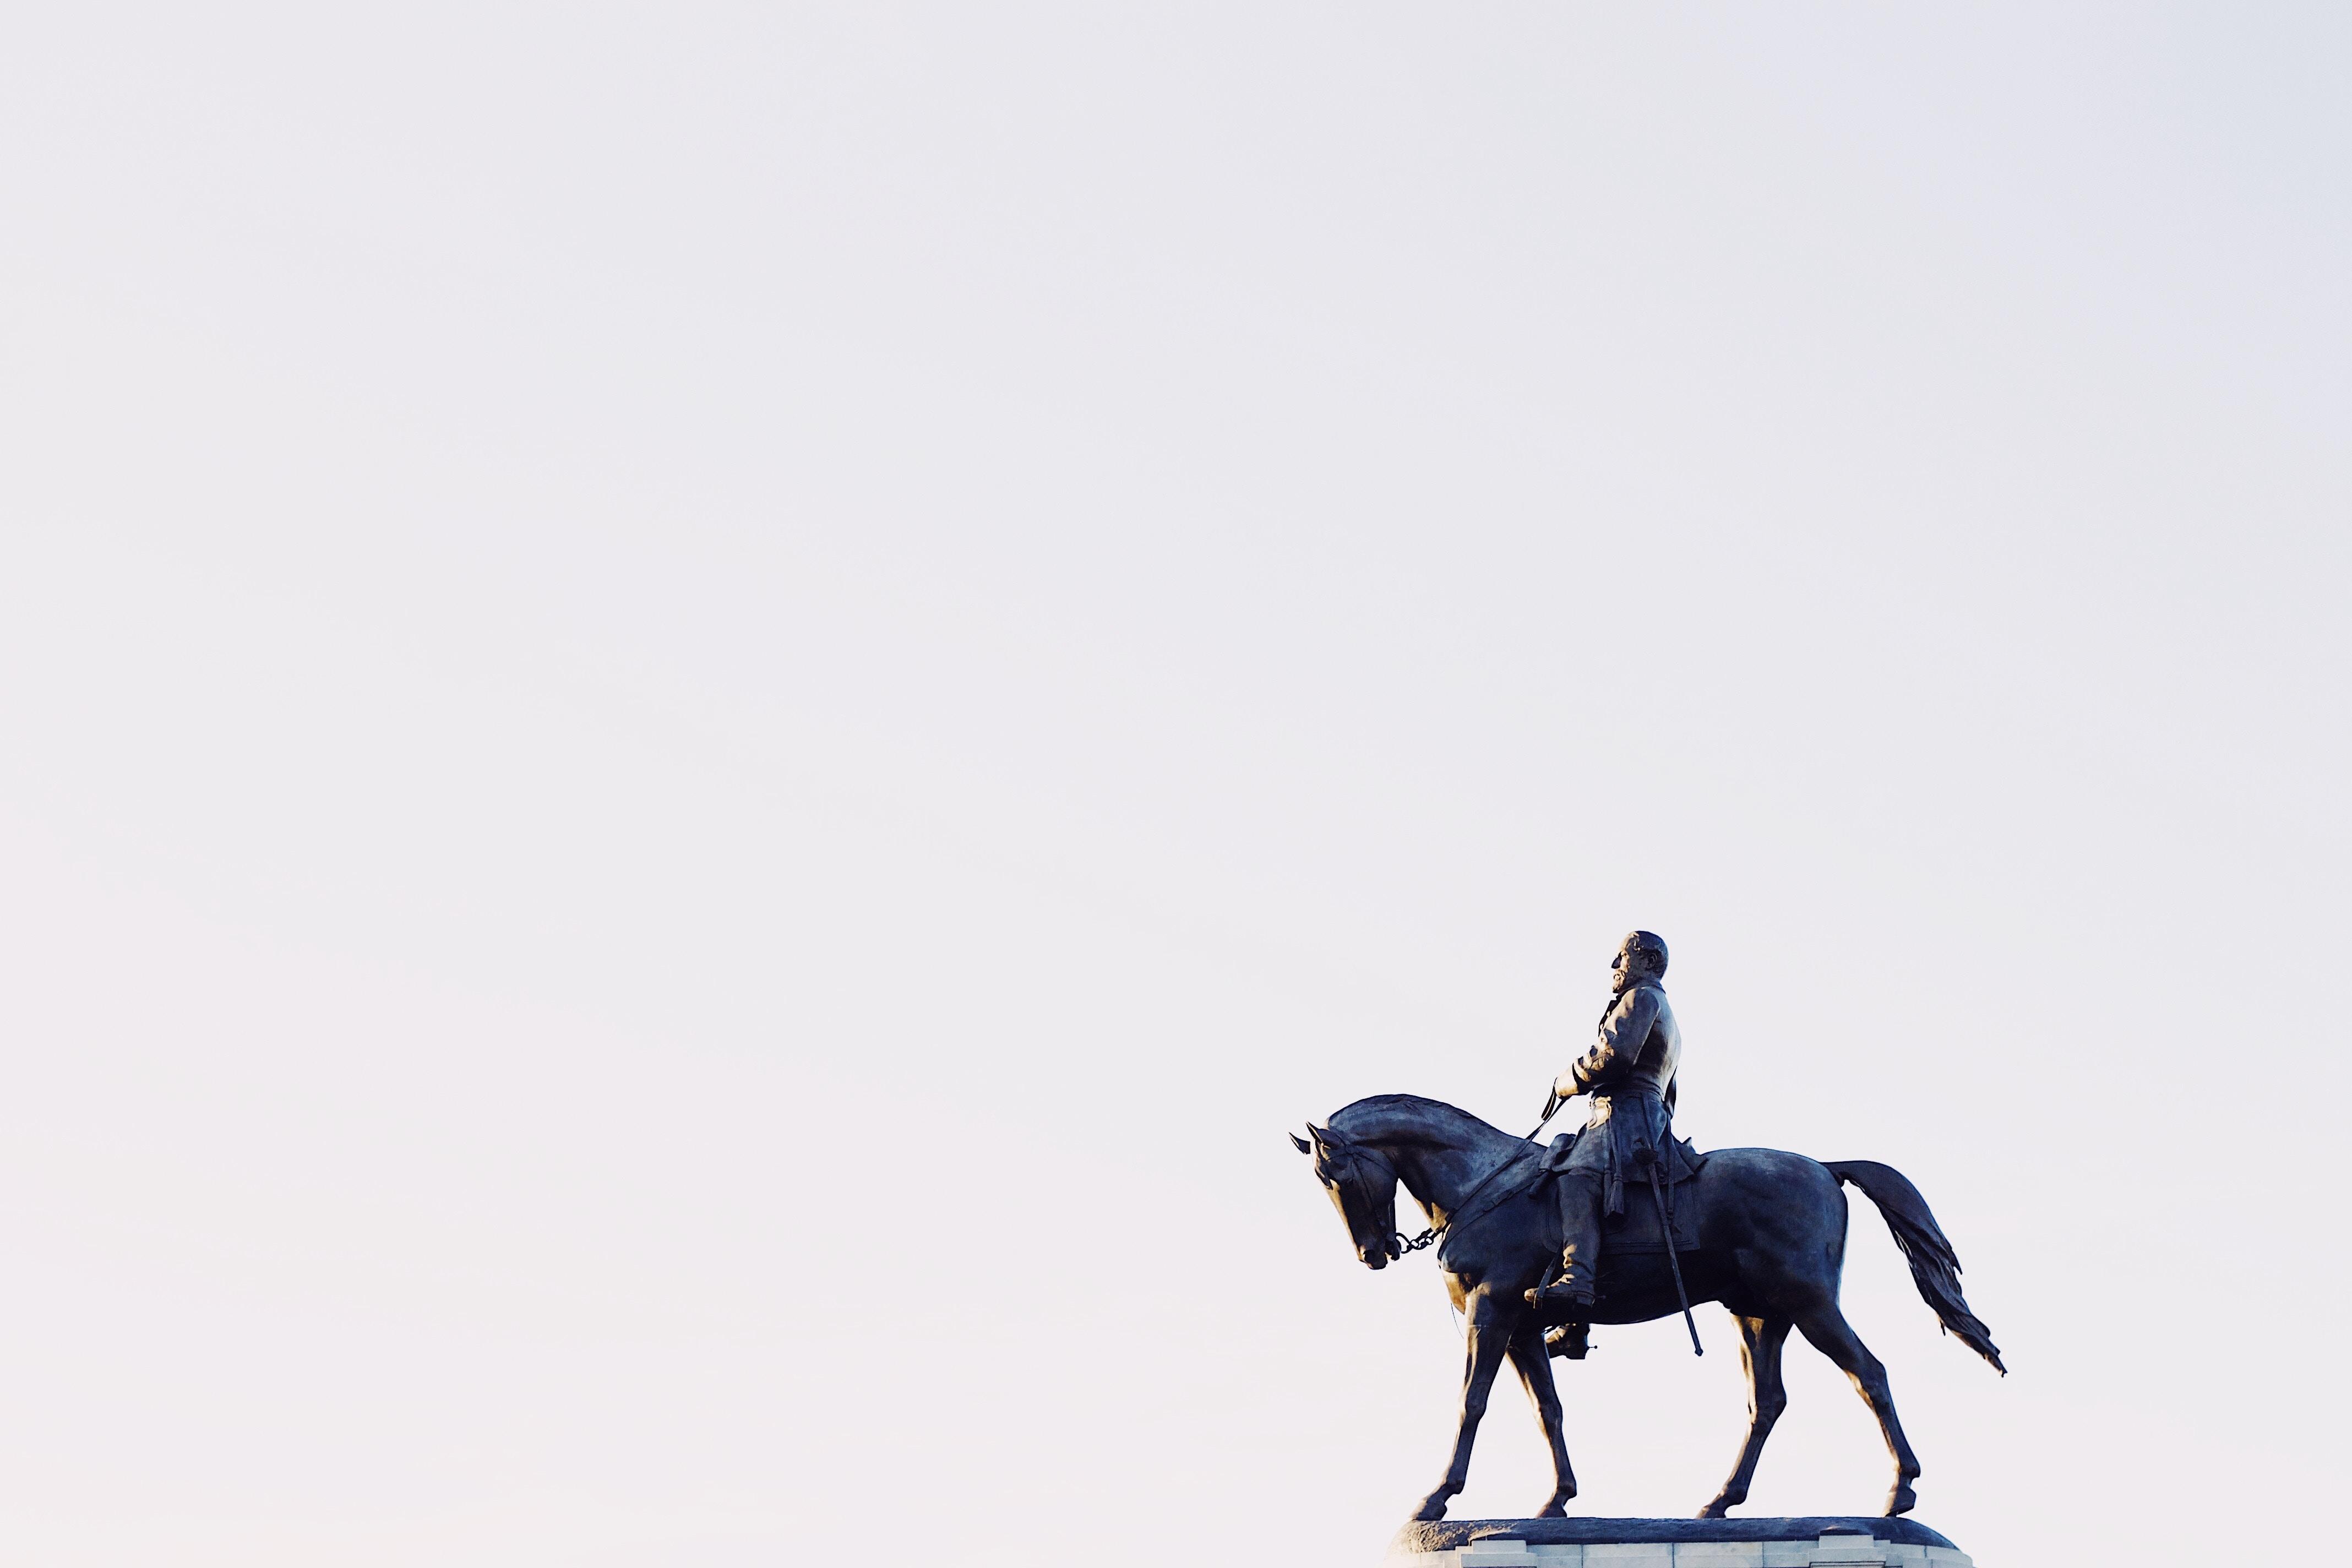 man riding horse illustration